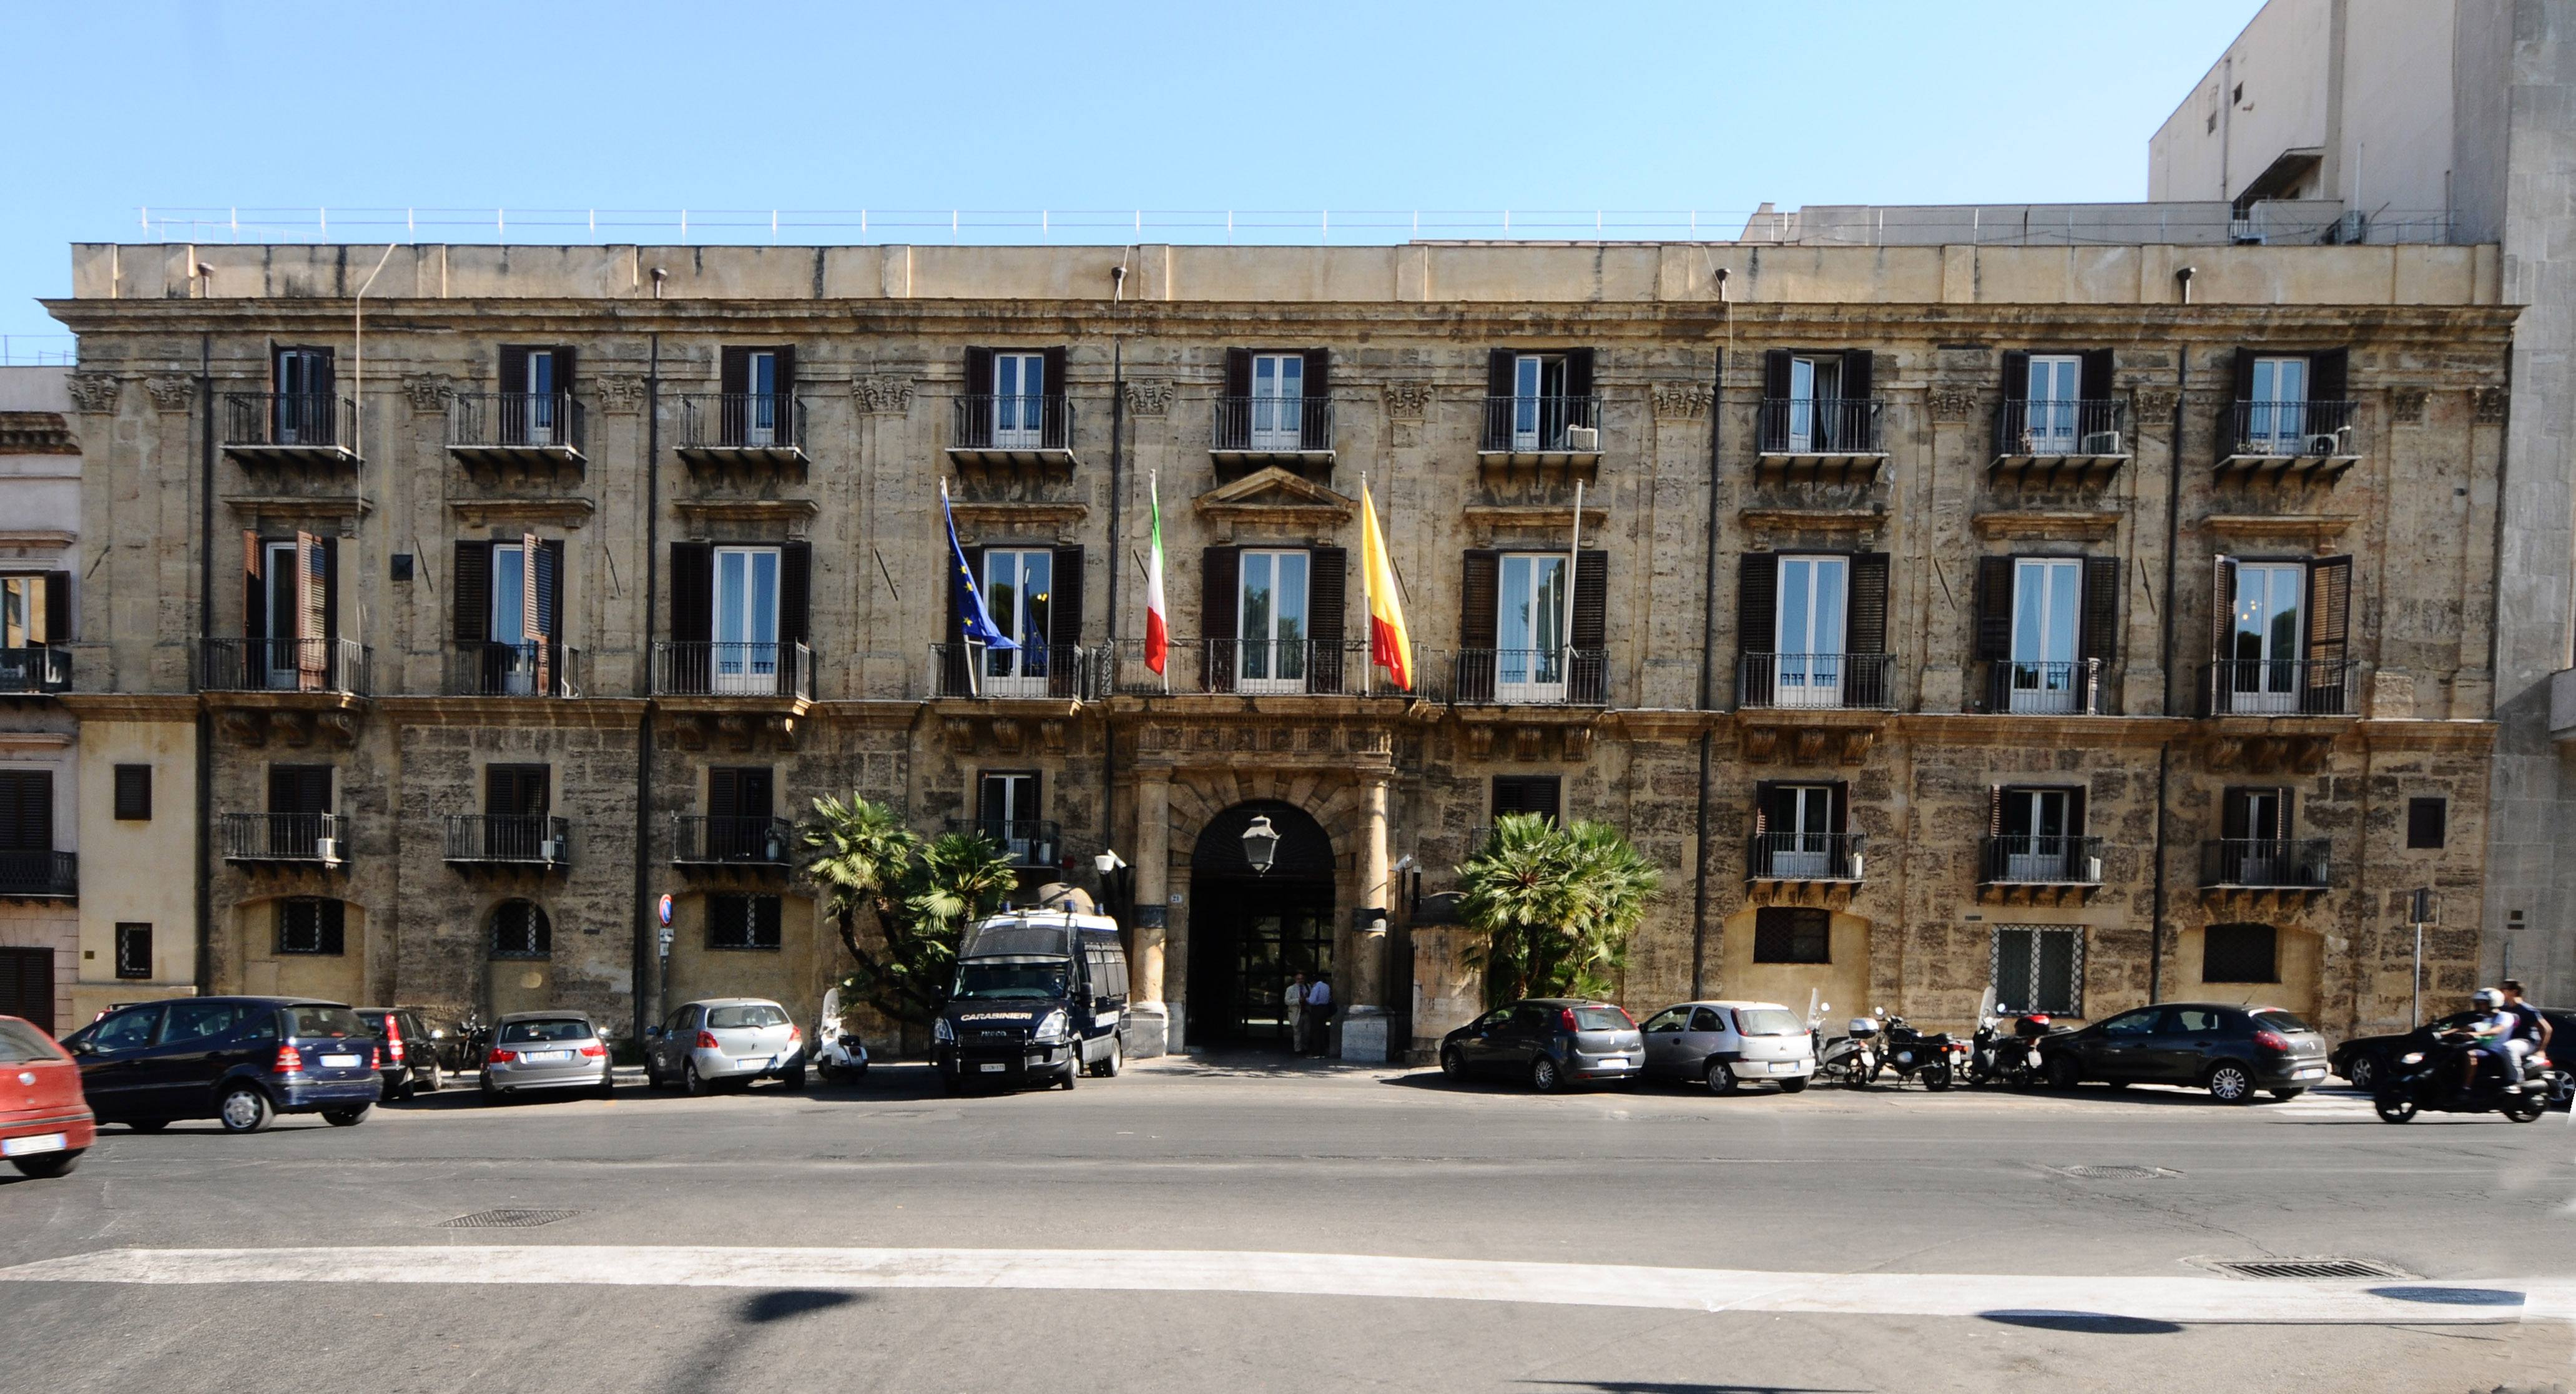 Palazzo D'orleans 22 novembre 2014.MIKE PALAZZOTTO